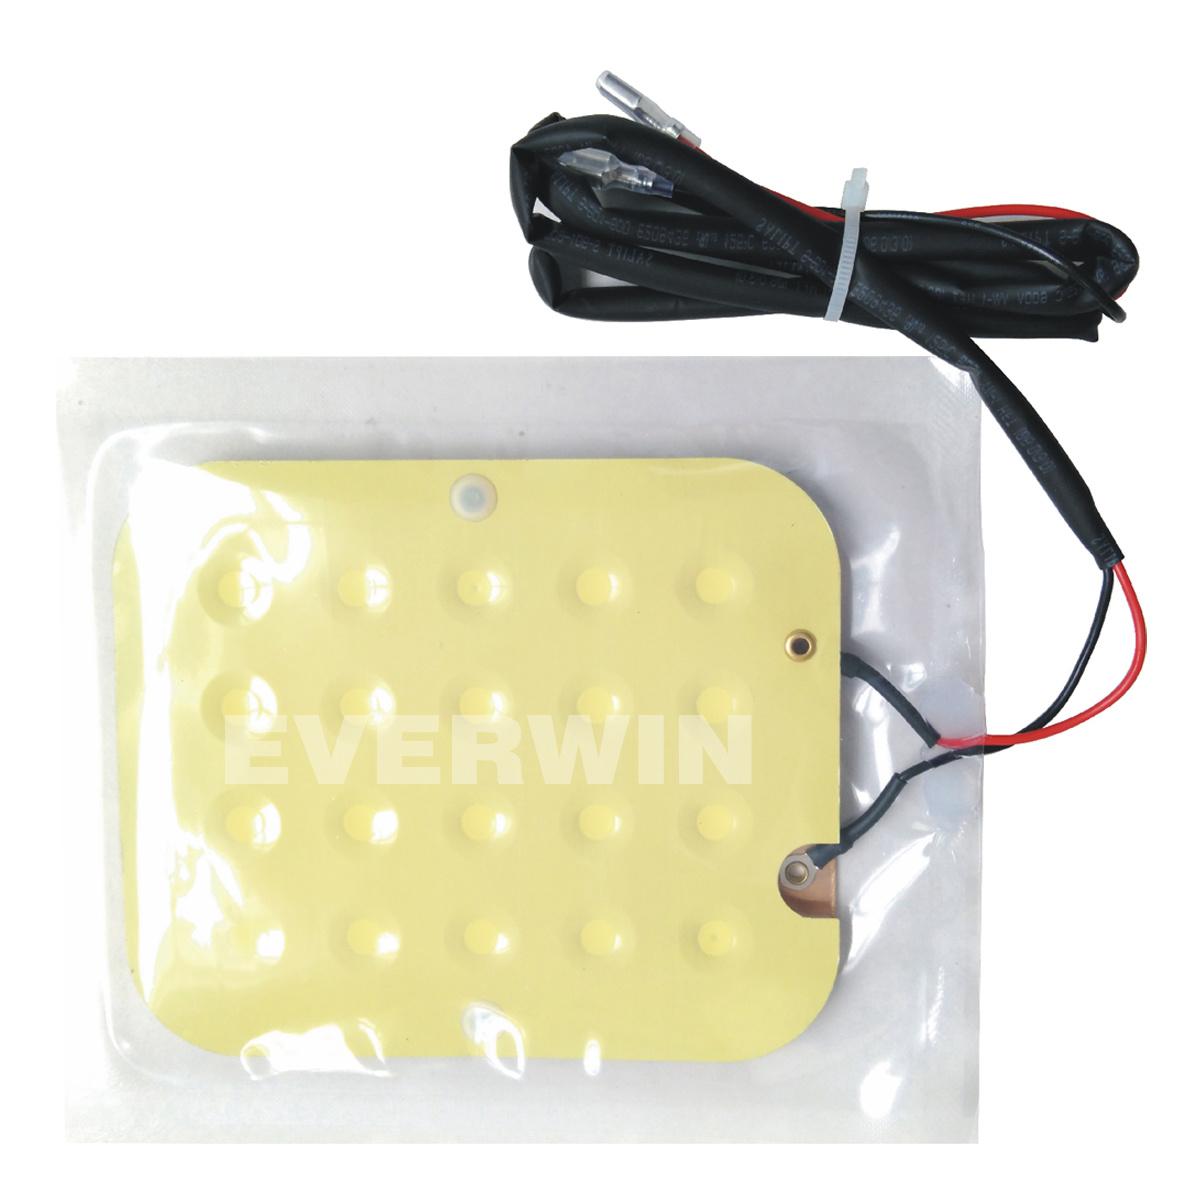 Ew20002 Waterproof Seat Switch Micro Switch OPS